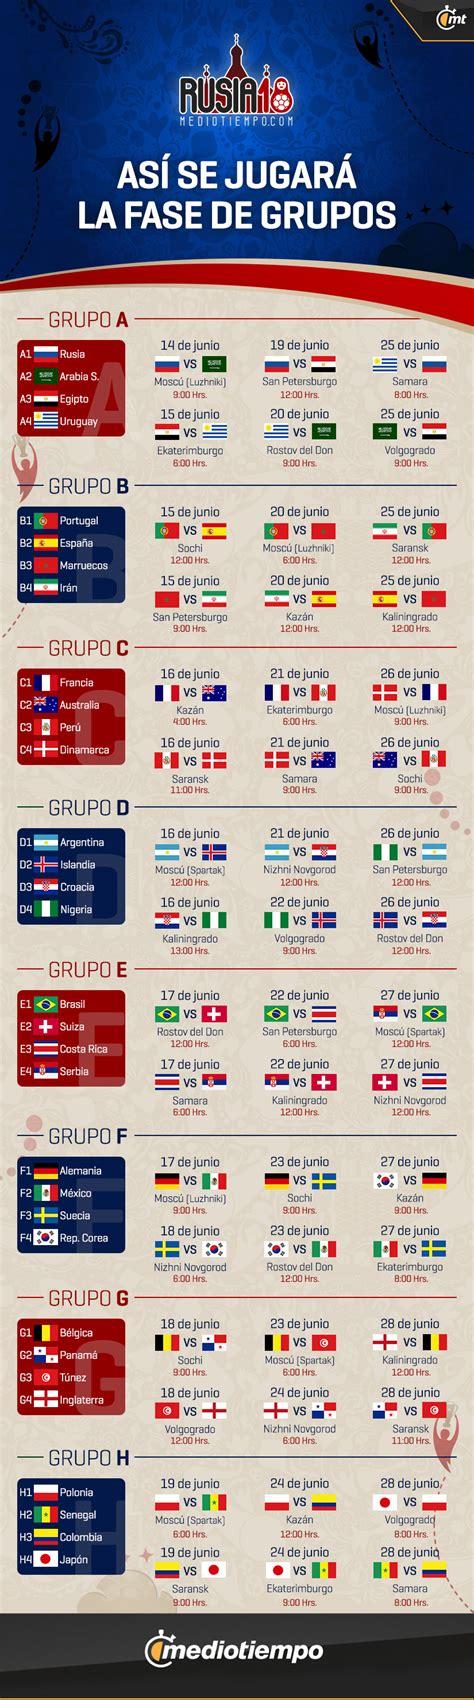 calendario sudamerica rusia 2018 calendario sudamerica rusia 2018 161 prepara las maletas